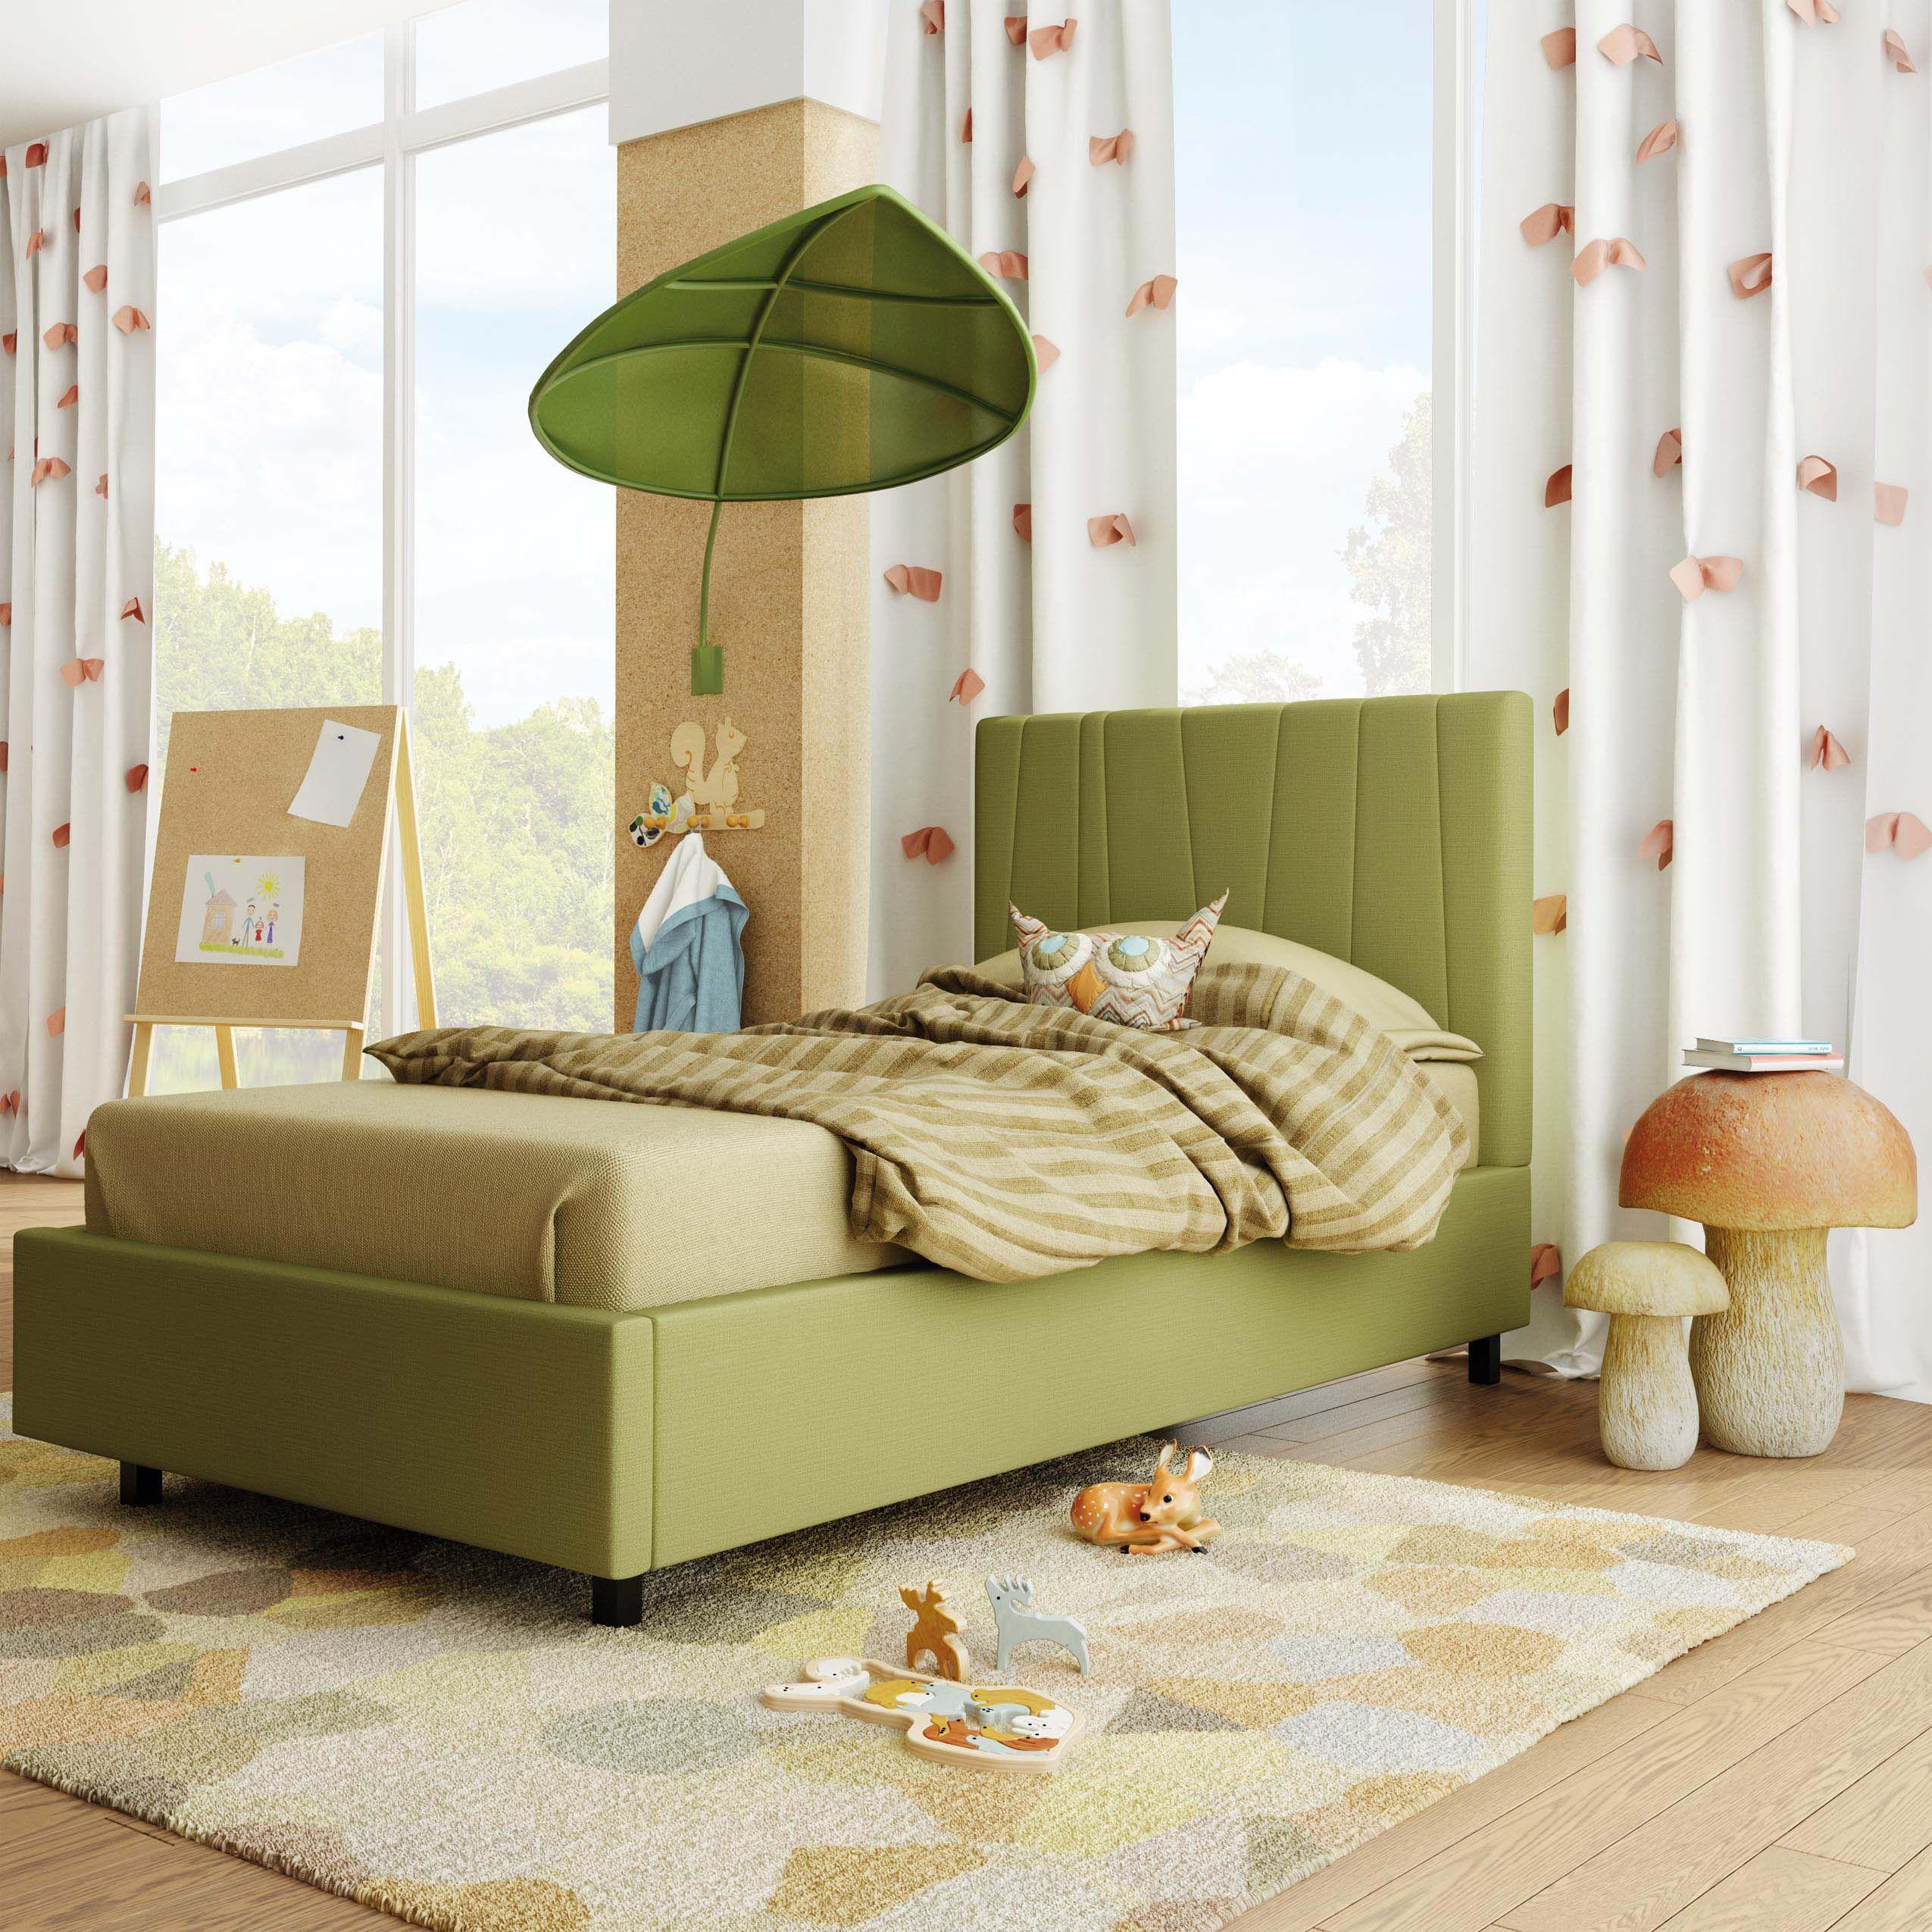 twin xl surrey and industrial on pinterest amisco bridge bed 12371 furniture bedroom urban